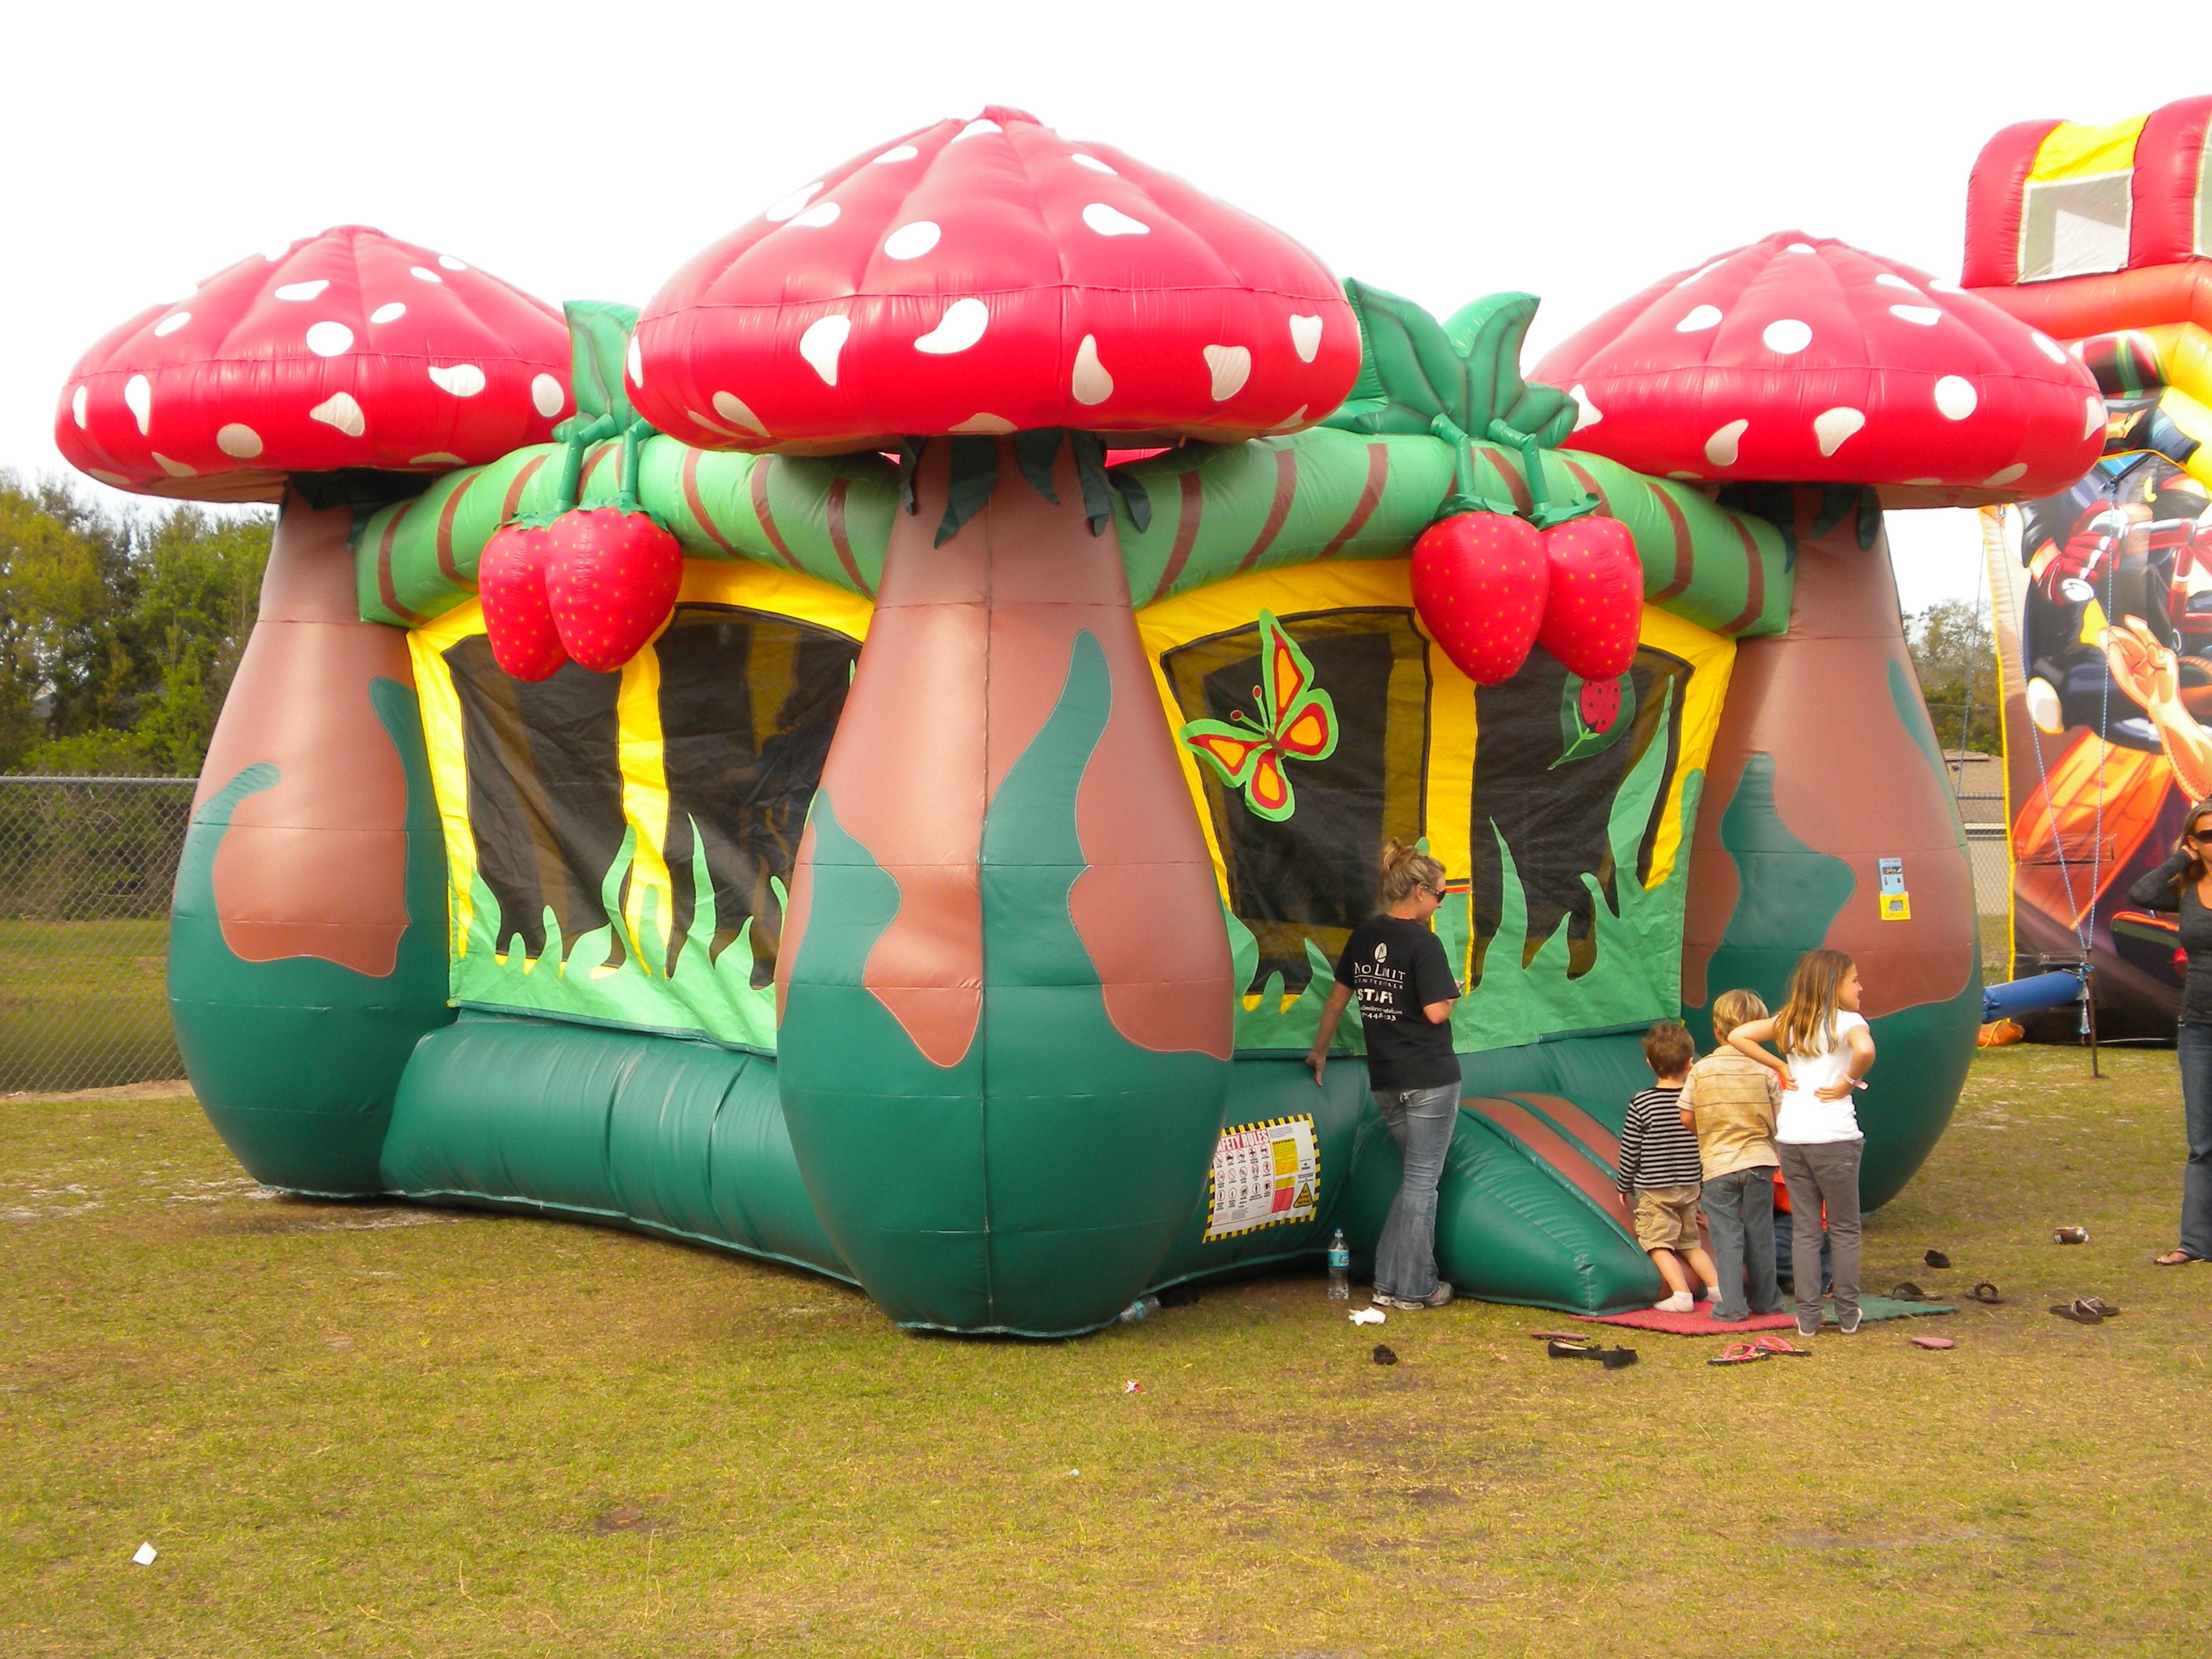 Strawberry Mushroom Bounce House